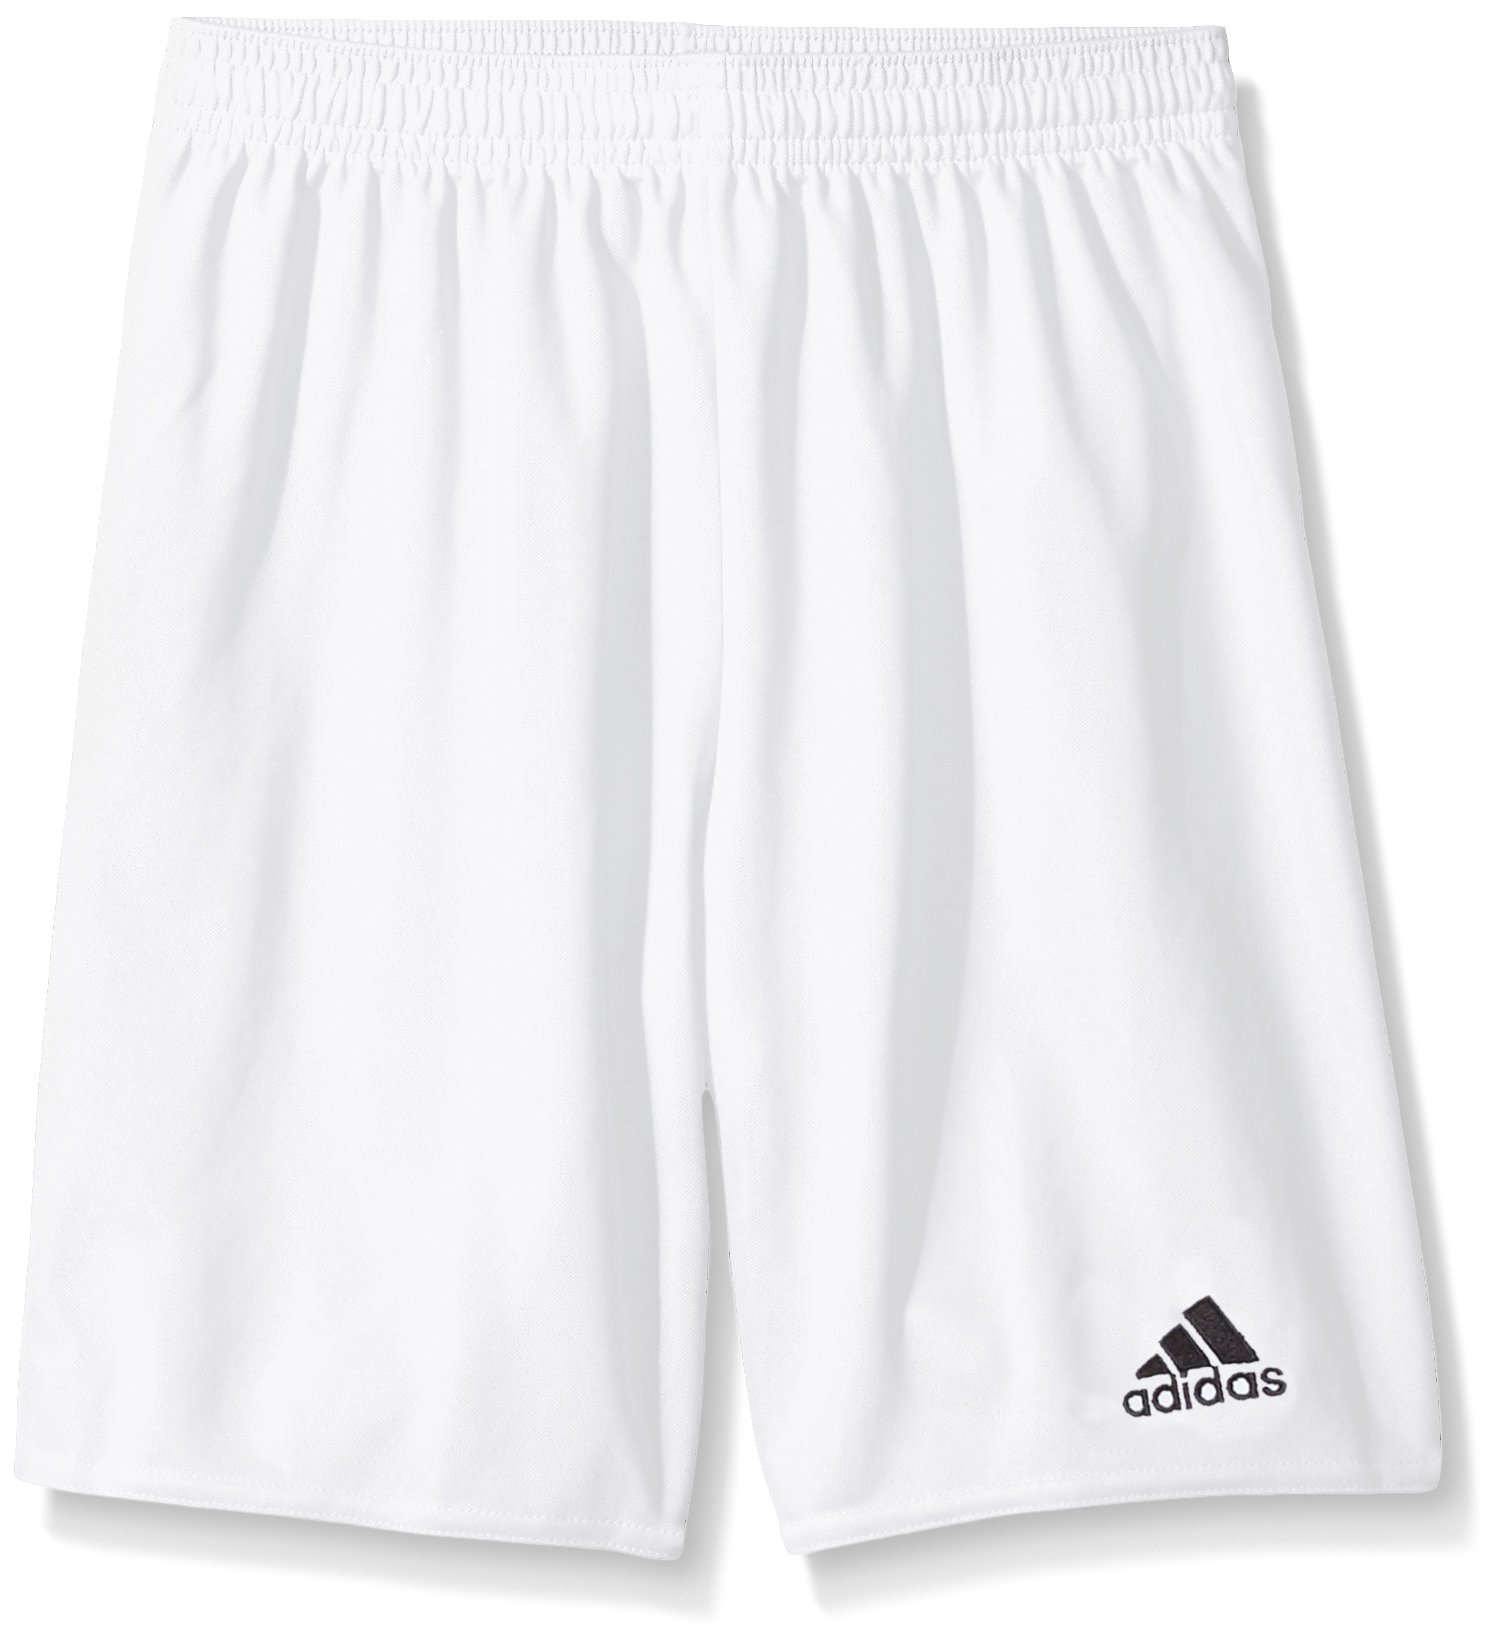 adidas Youth Parma 16 Shorts, White/Black, Large by adidas